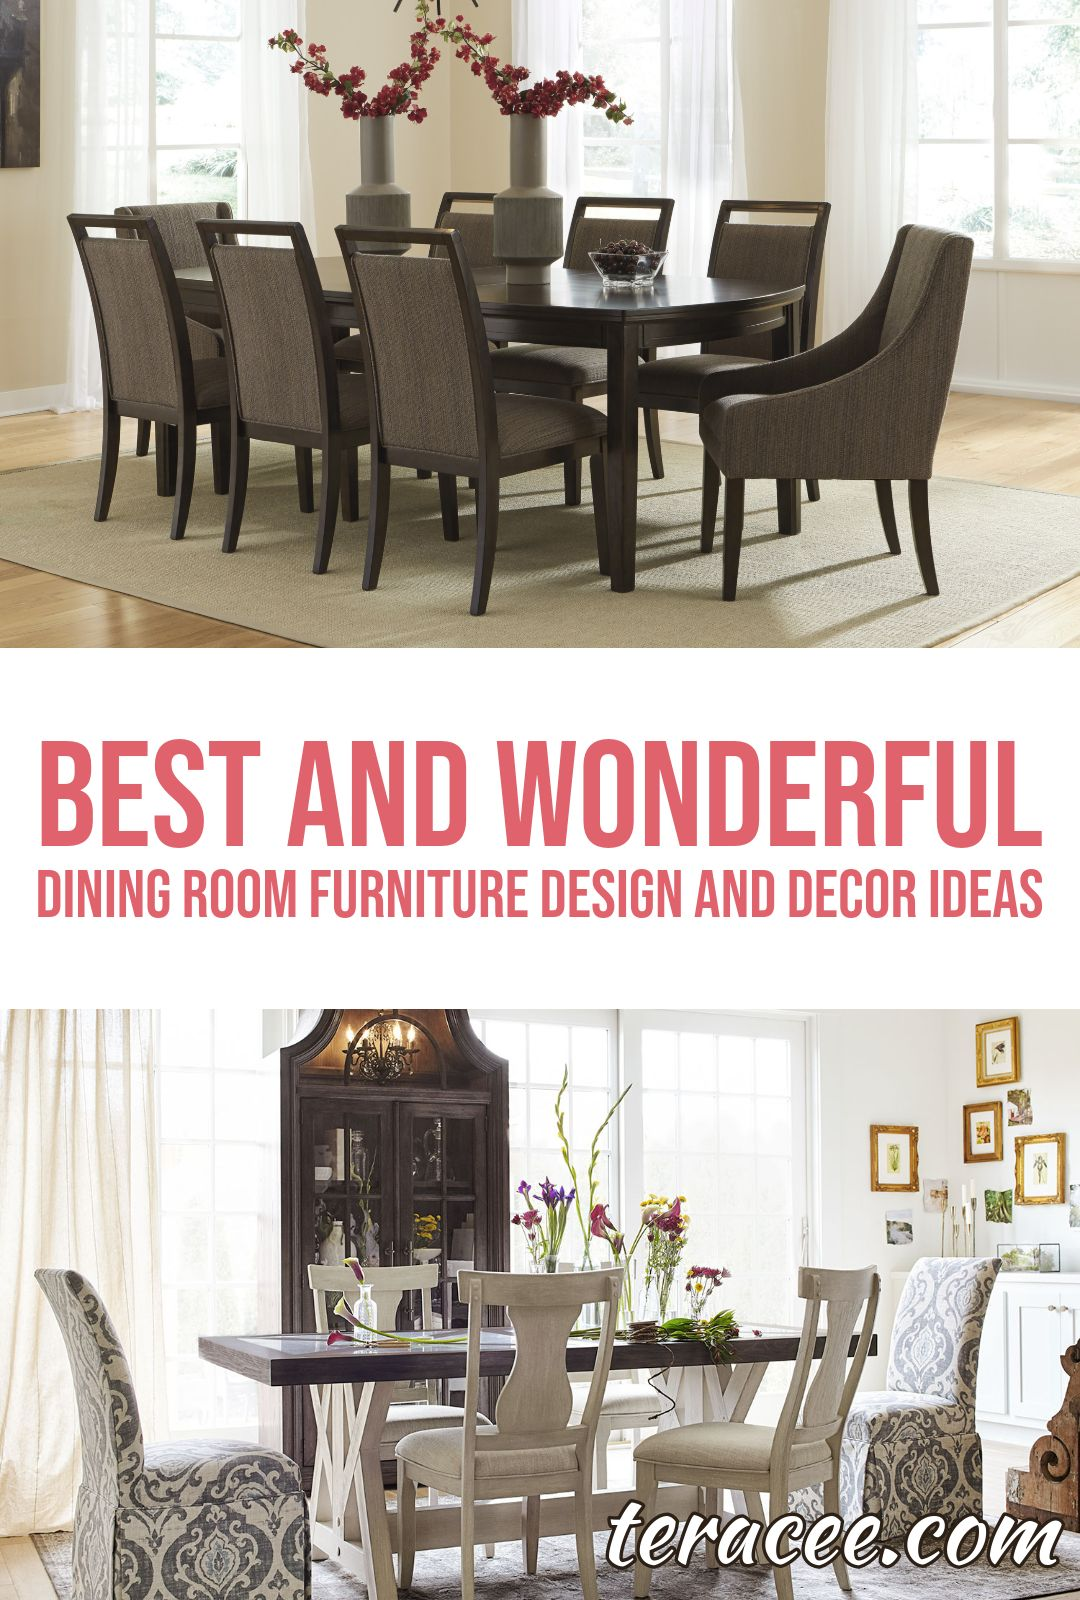 17 best and wonderful dining room furniture design and decor ideas rh pinterest com